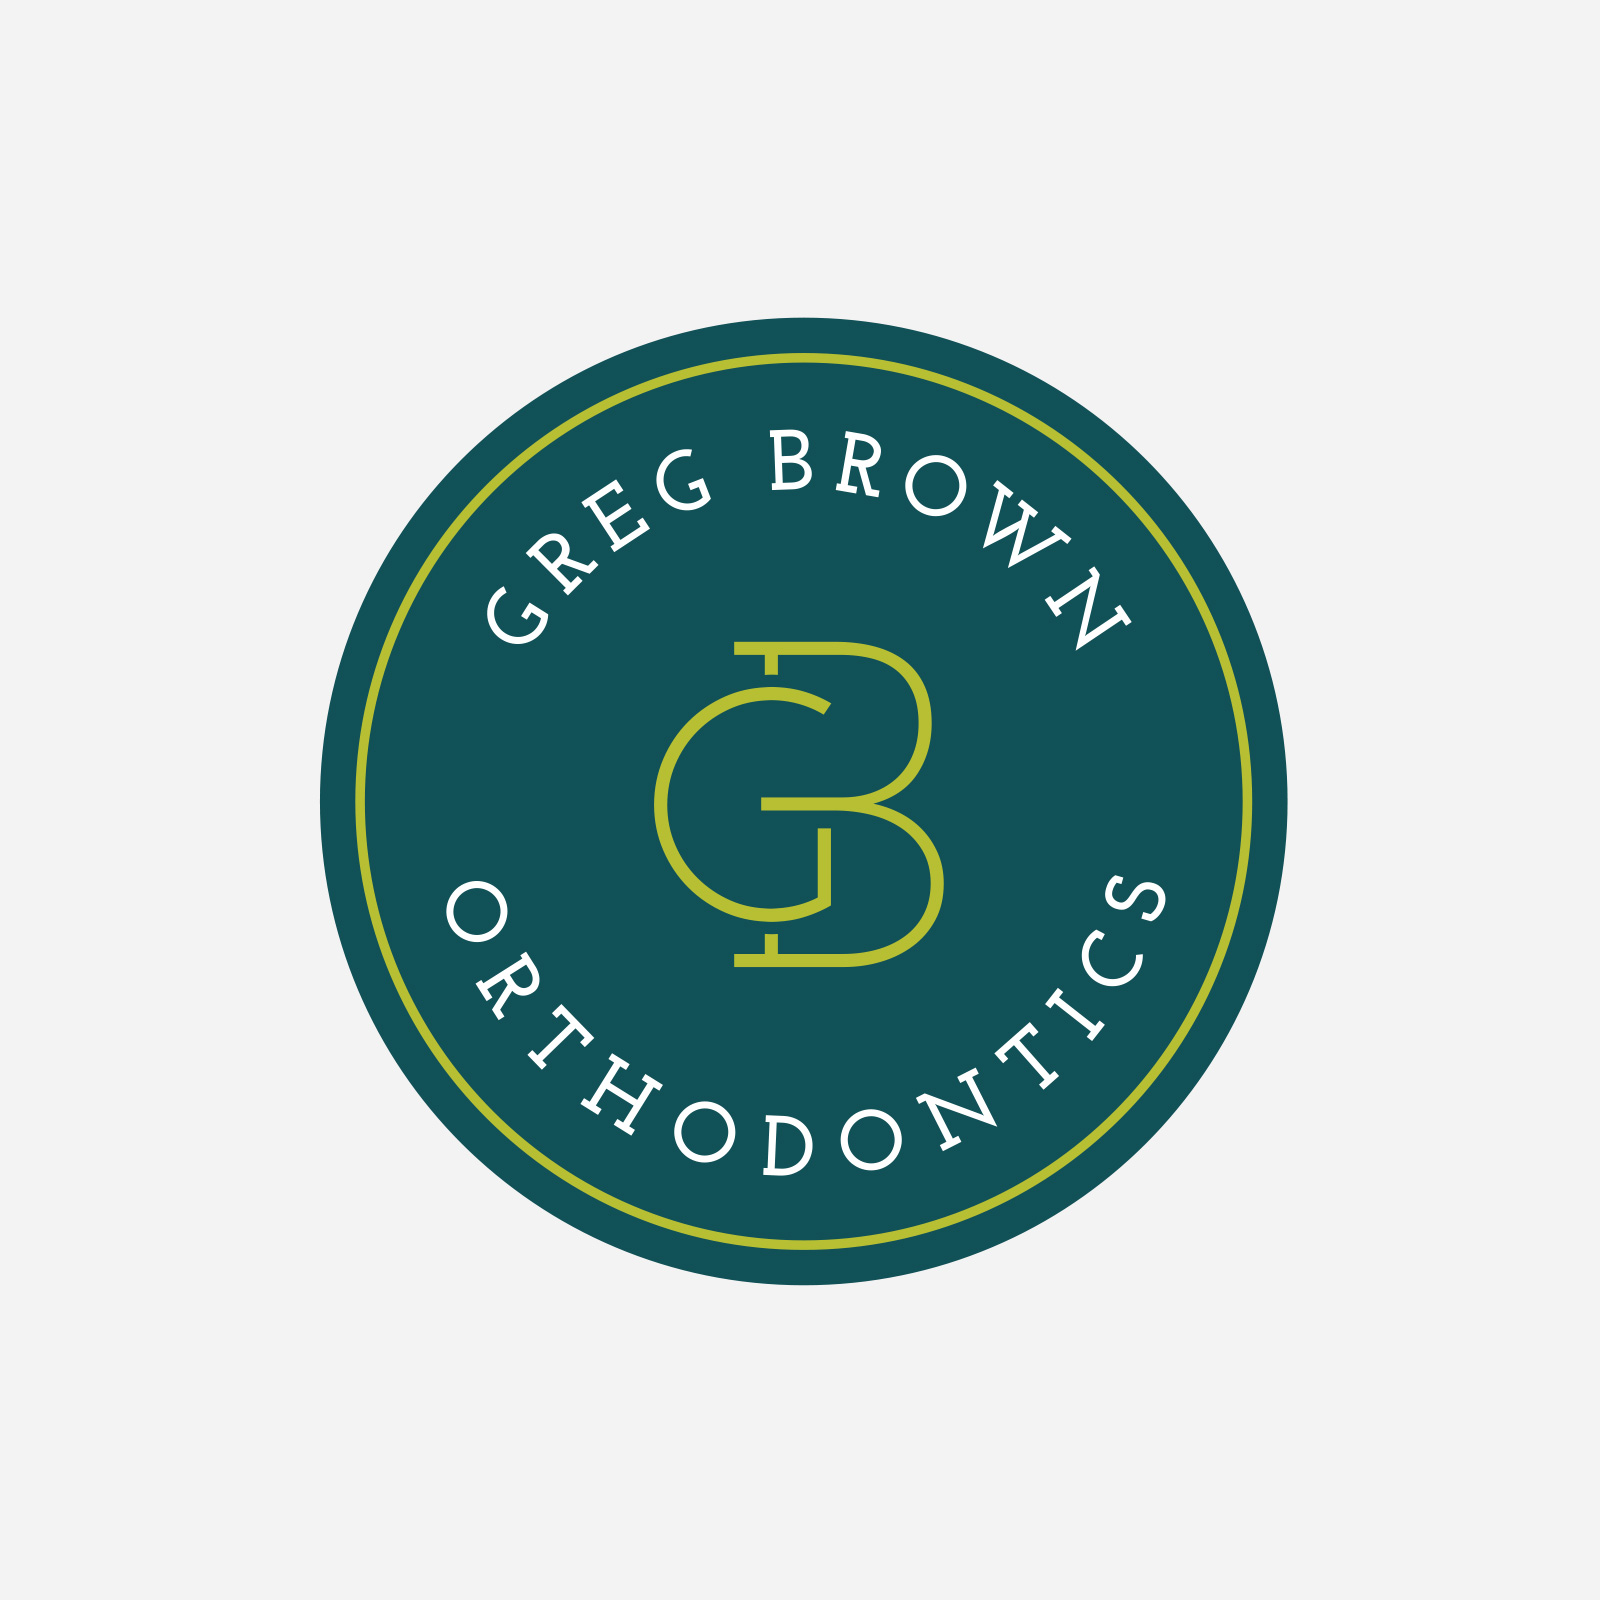 GregBrown.jpg